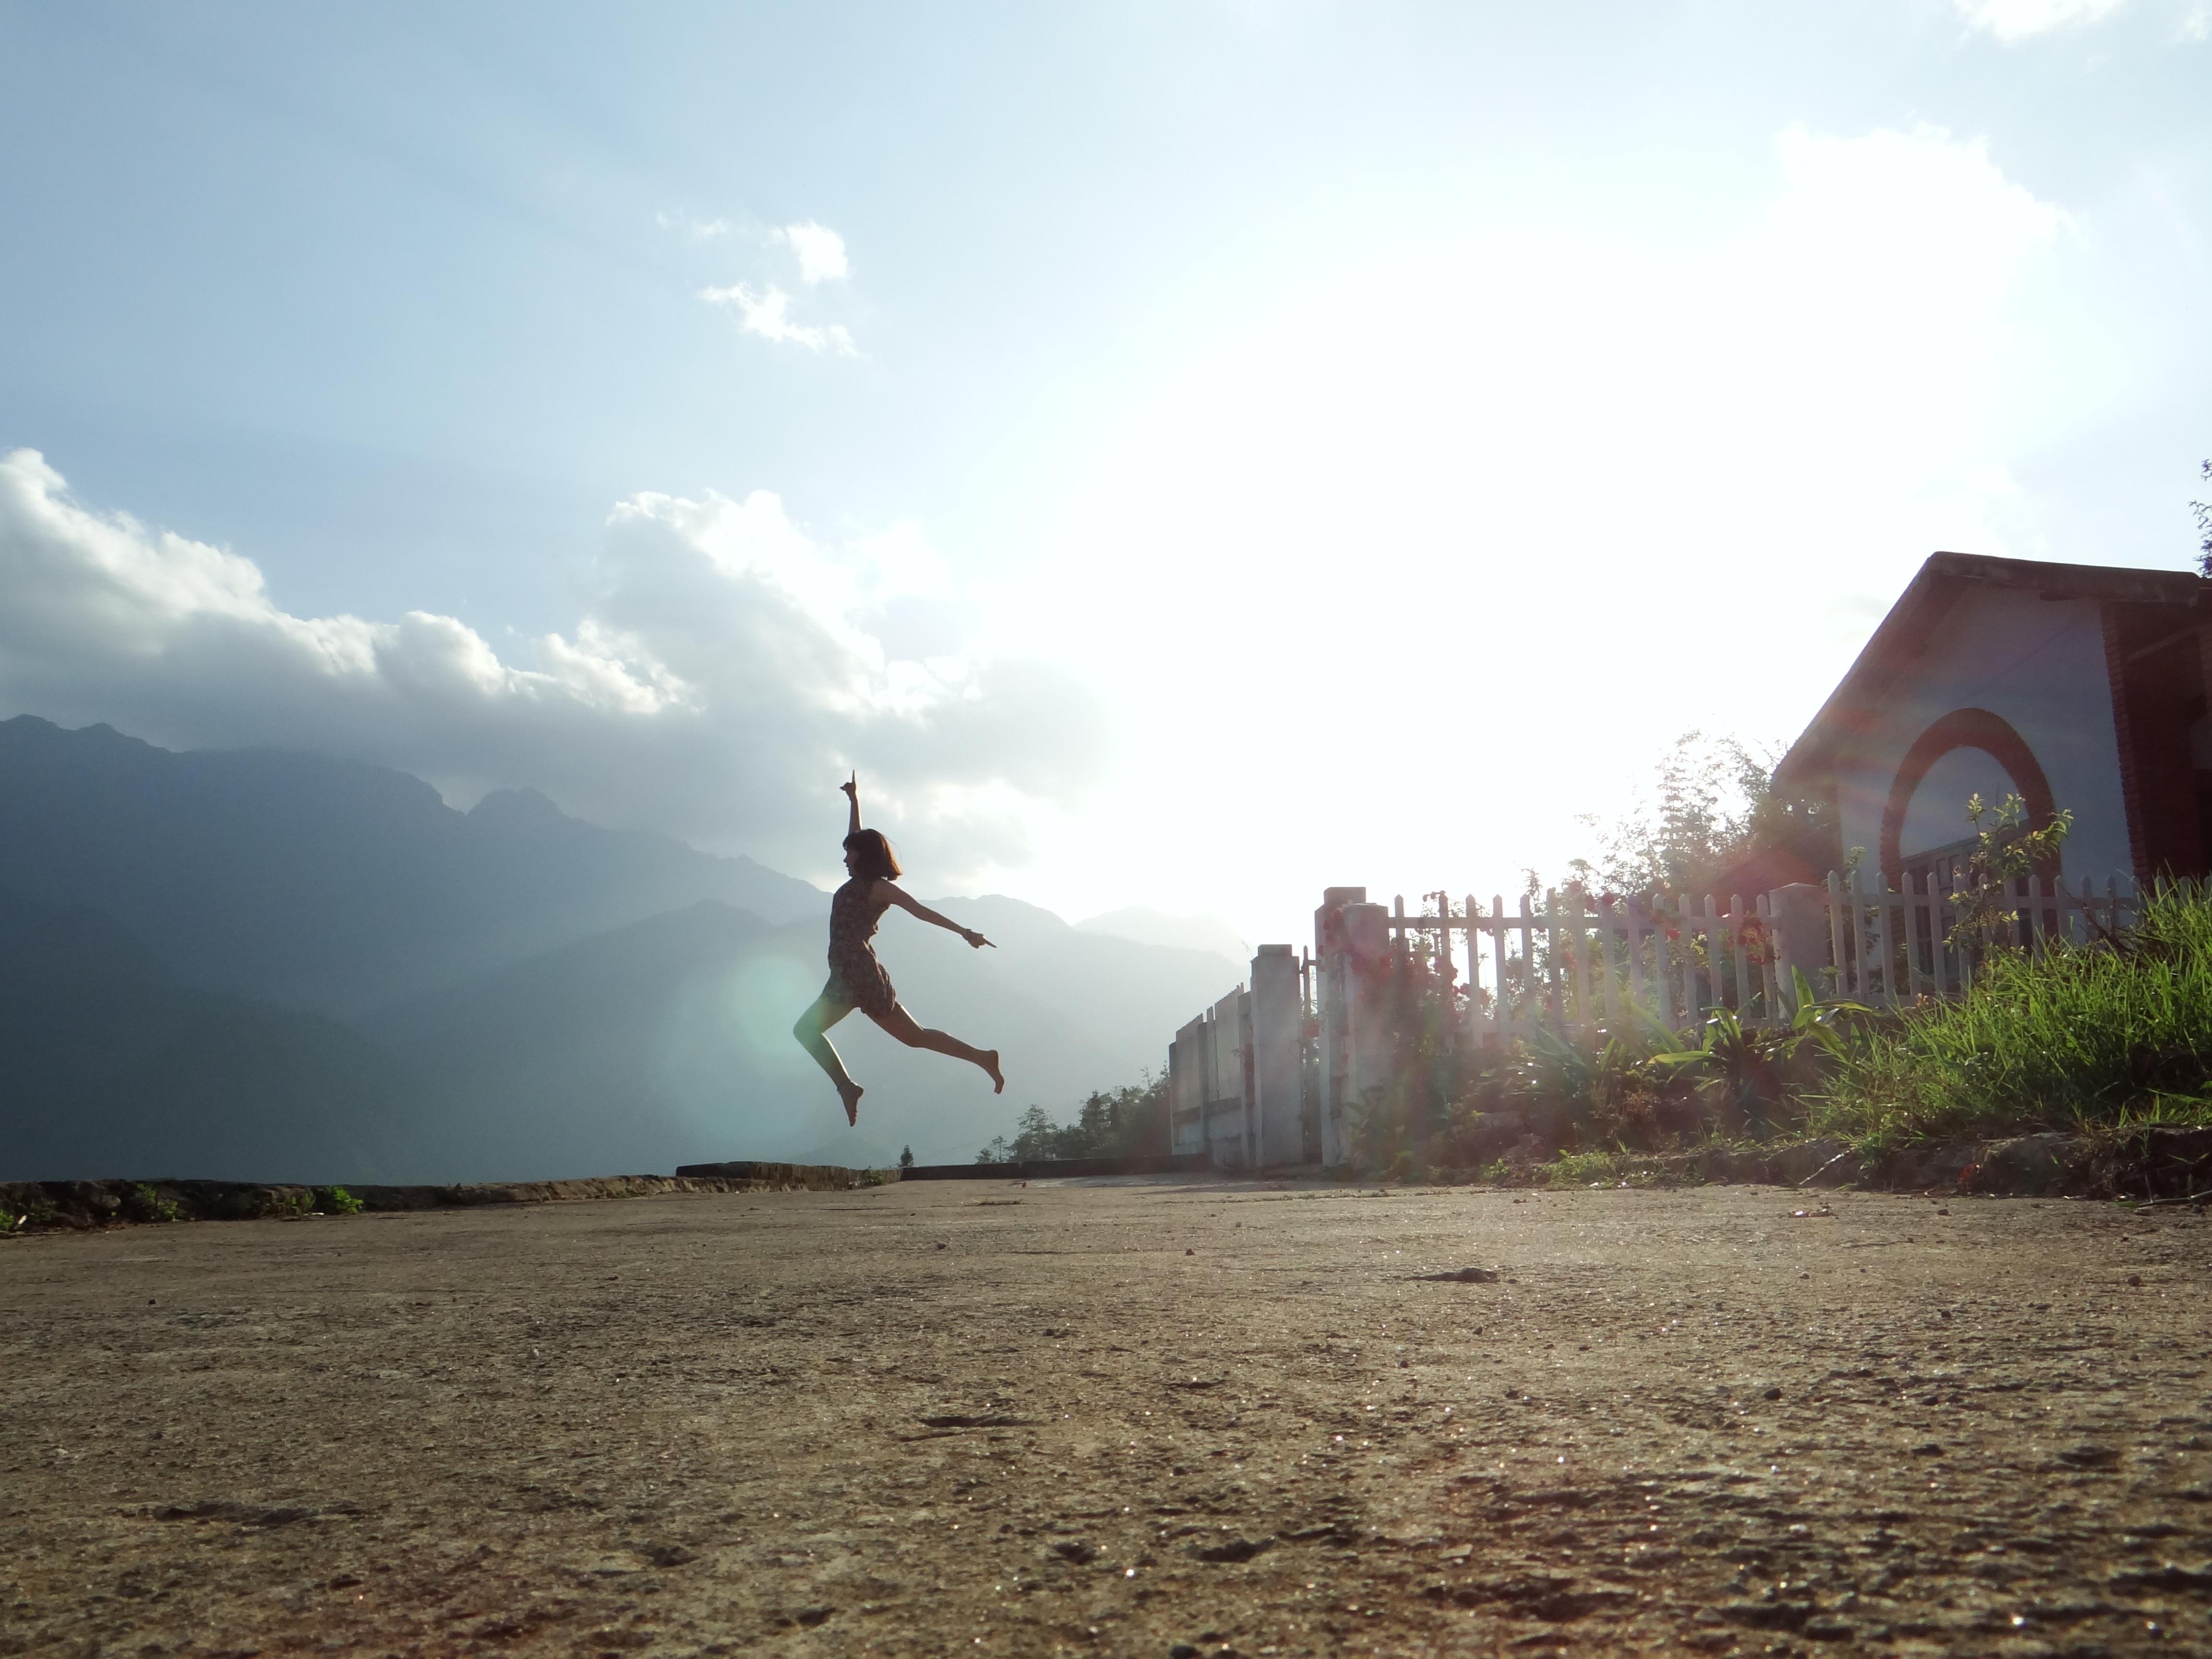 Jump, Residence, Shoot, Pose, Woman, HQ Photo